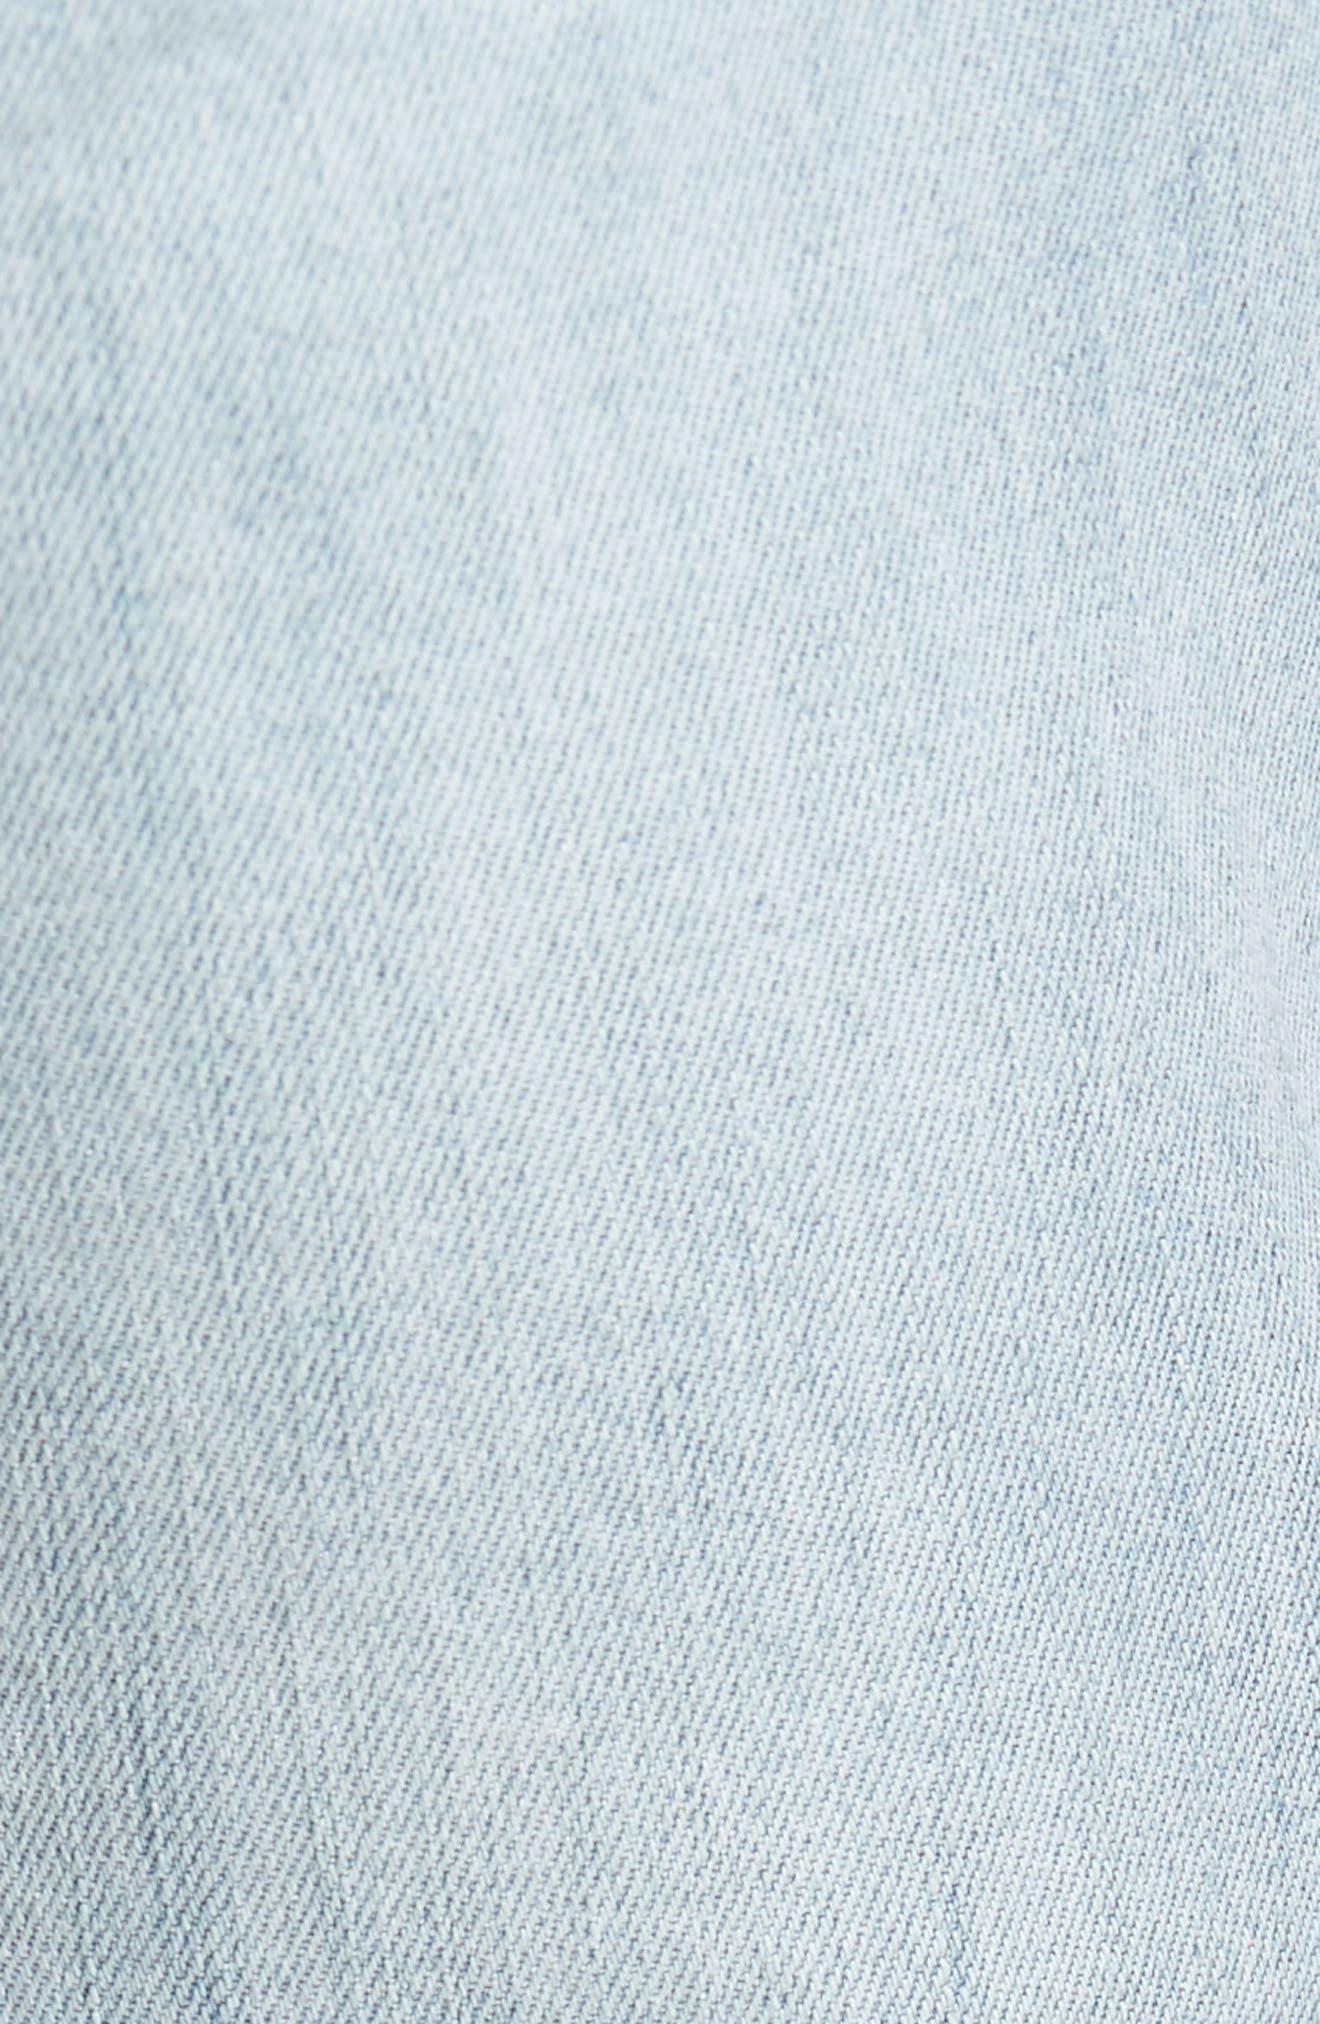 Juvee II Skinny Fit Jeans,                             Alternate thumbnail 5, color,                             400